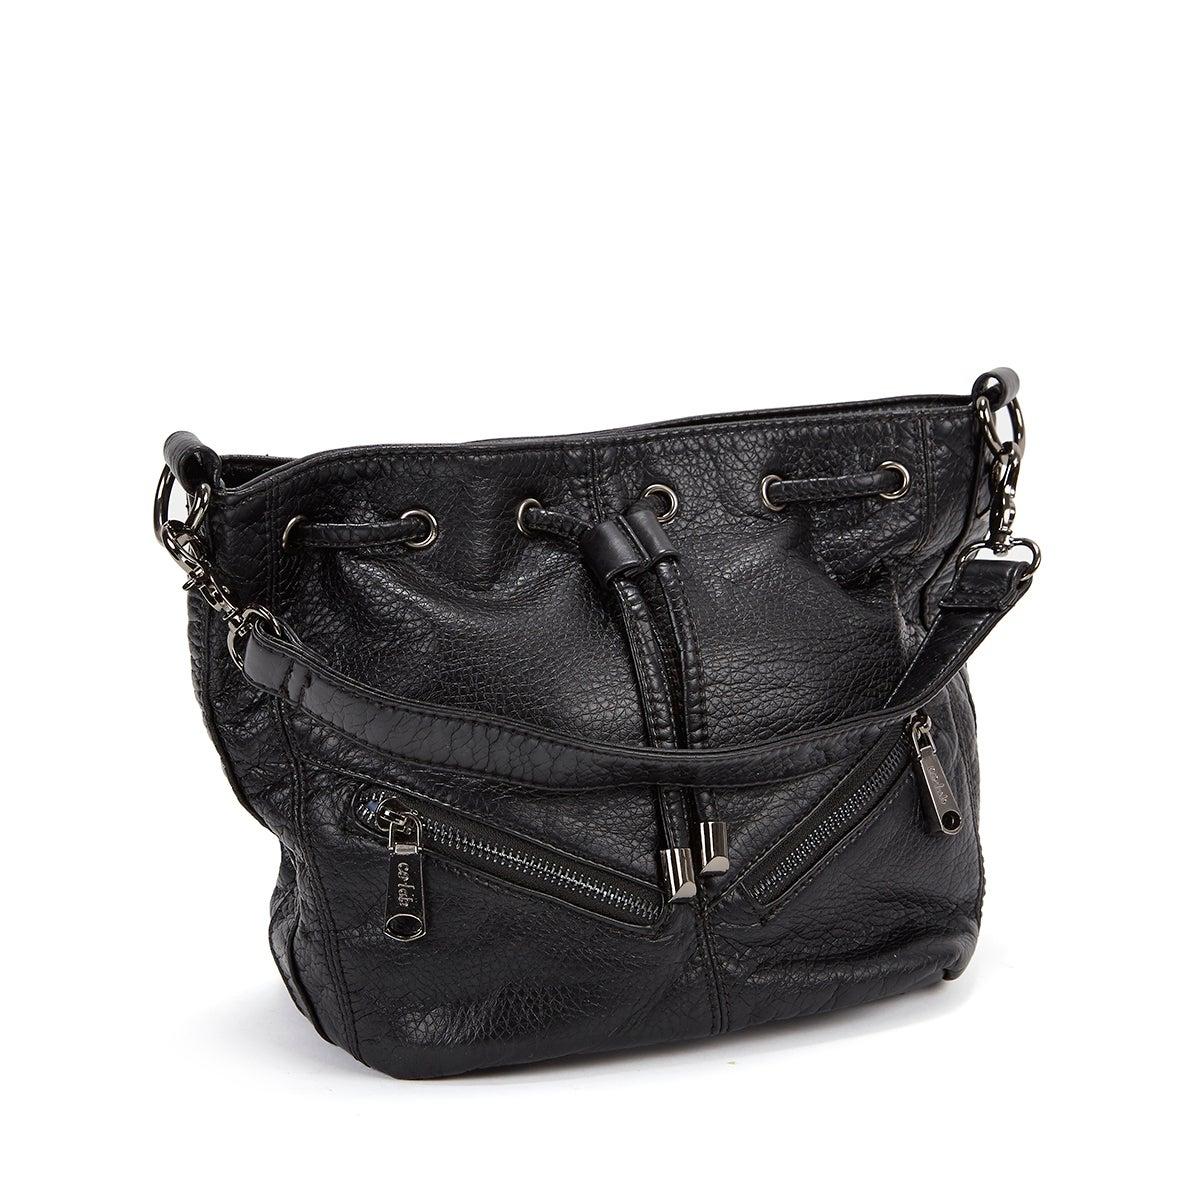 Lds The Wash black cross body bag